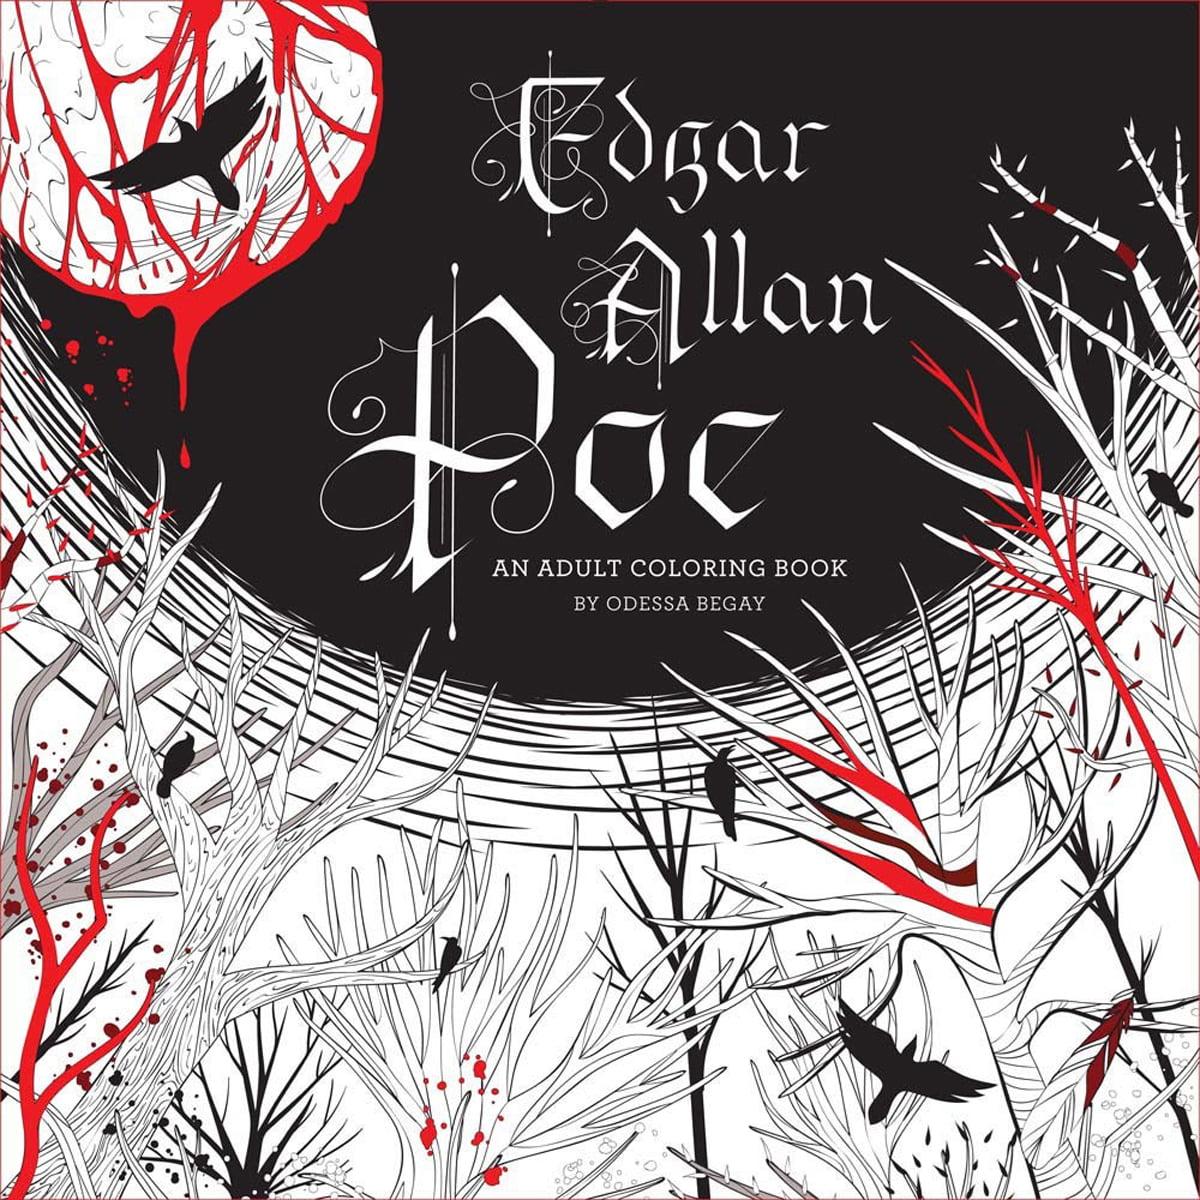 Lark Books-Edgar Allan Poe: An Adult Coloring Book